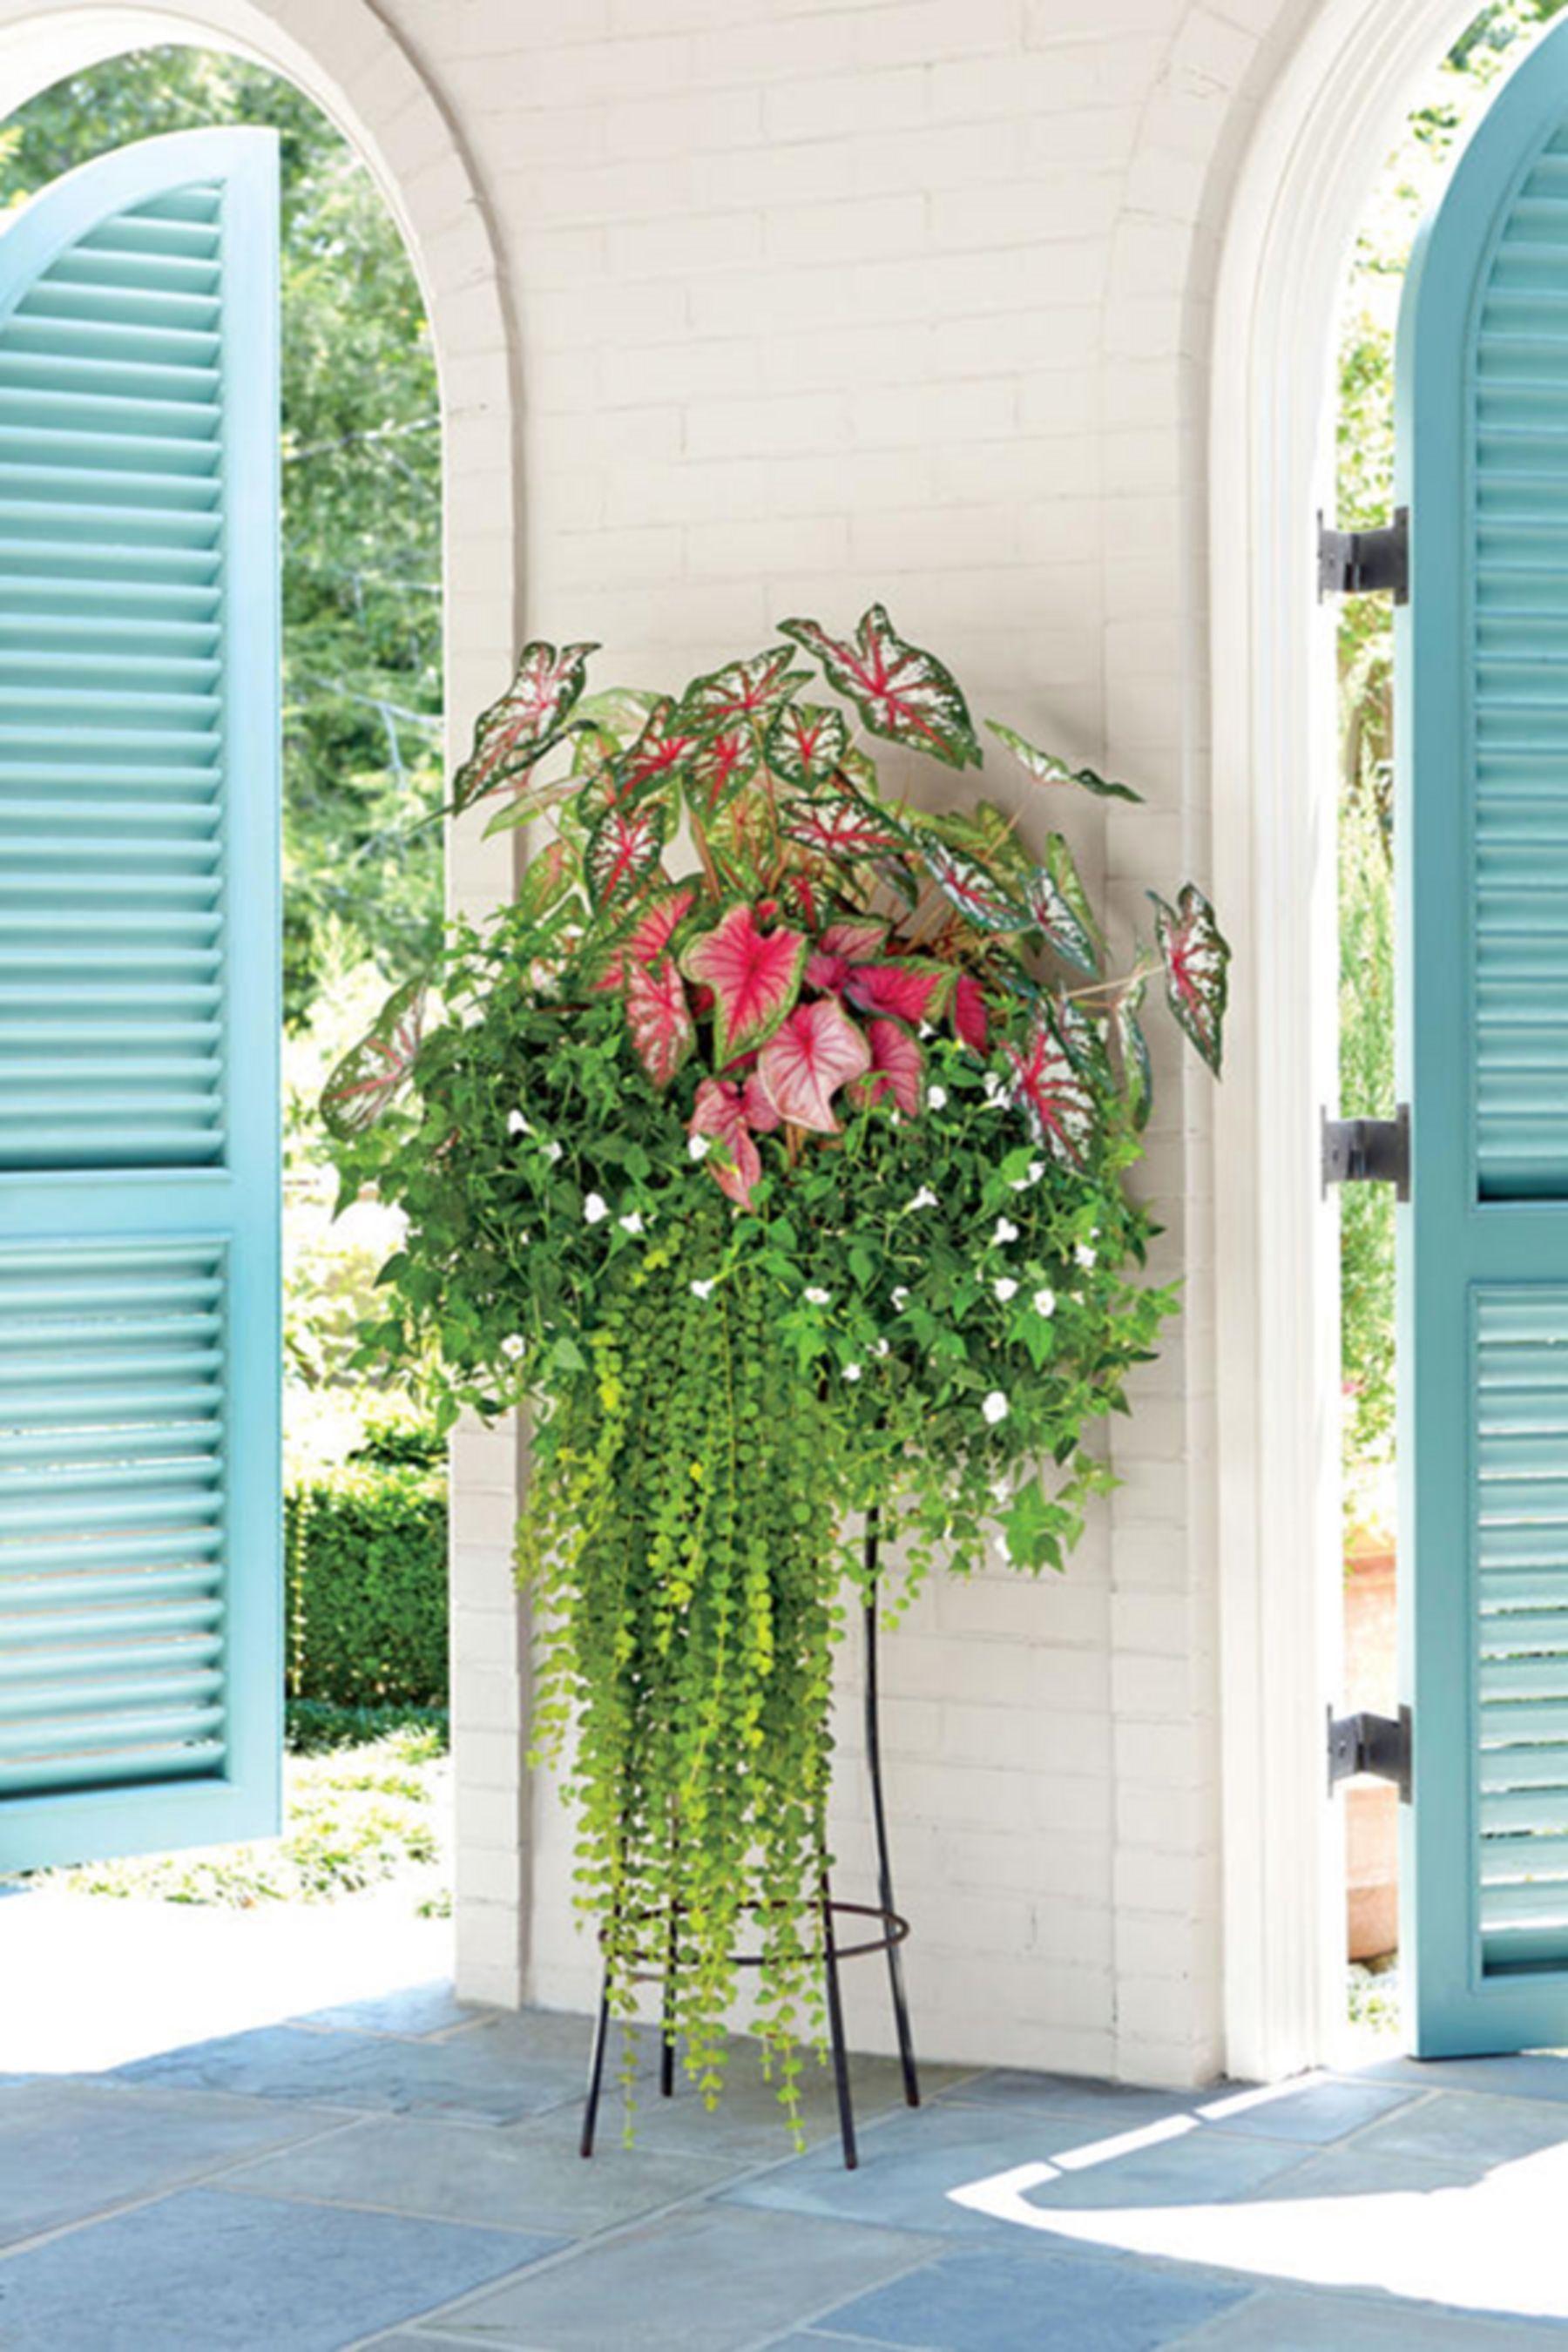 15 Stunning Fall Container Garden Ideas For Your Best Garden Inspirations #shadecontainergardenideas